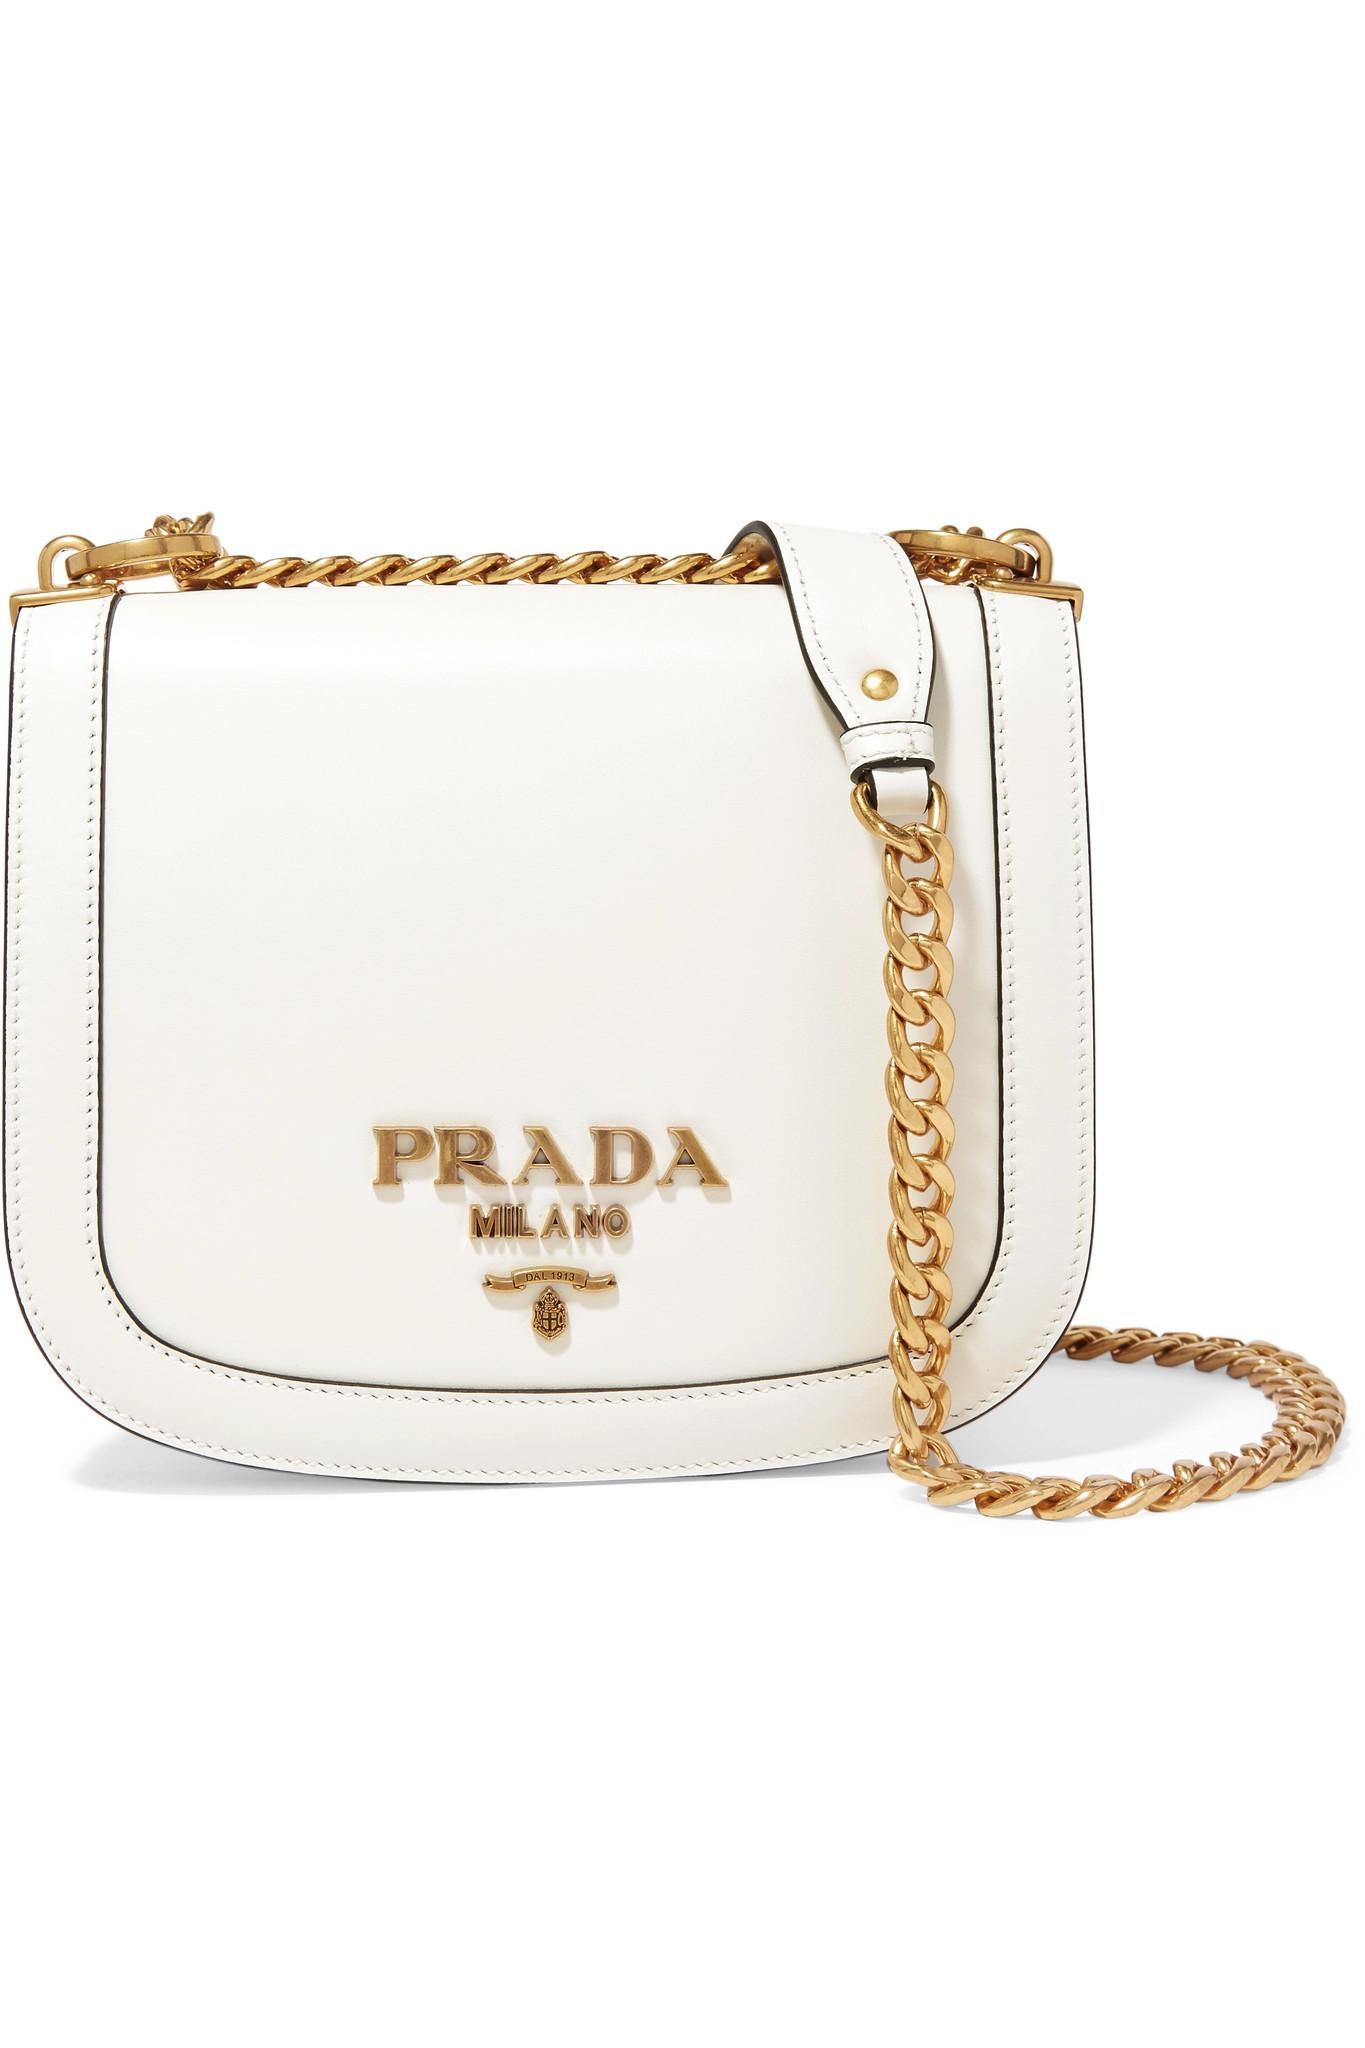 5c3c4cff85f9 Prada - White Pionnière Leather Shoulder Bag - Lyst. View fullscreen